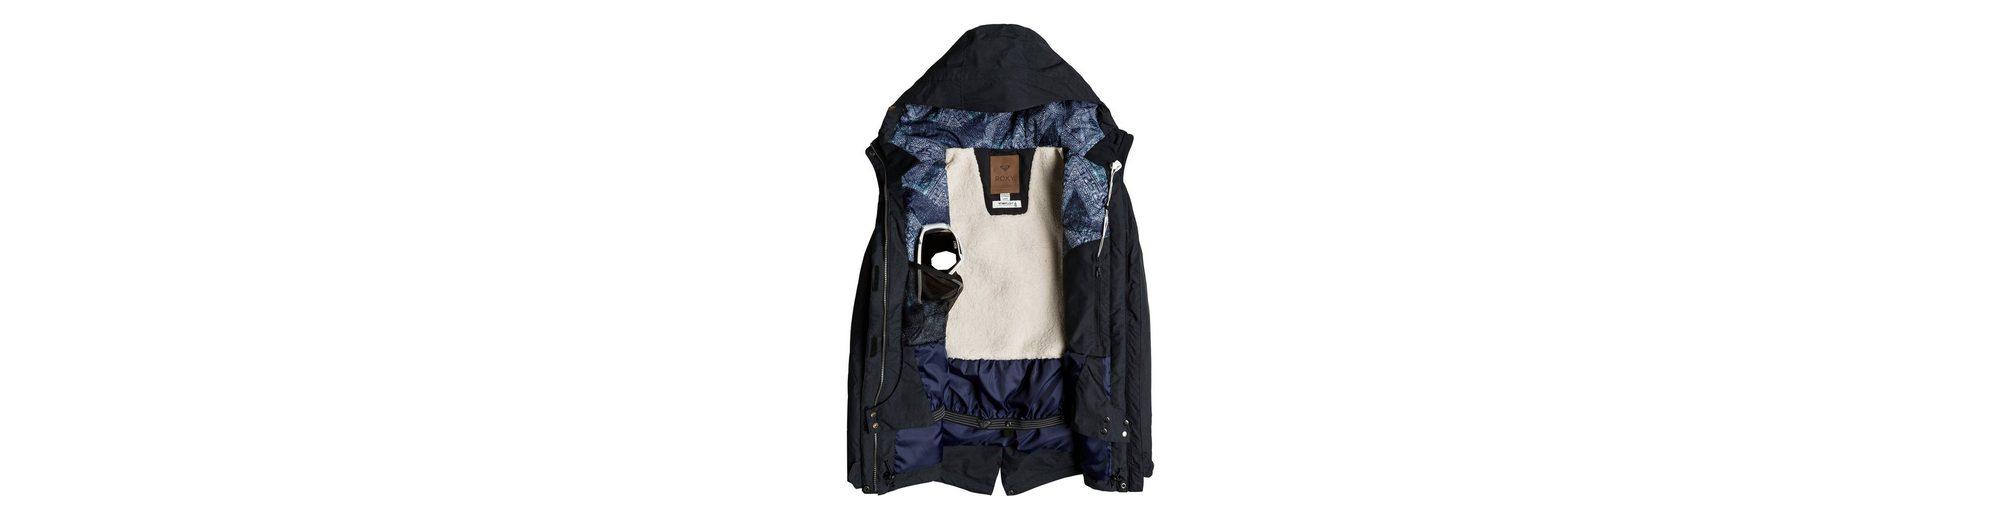 Billig Verkauf Amazon Verkaufsstelle Roxy Snow Jacke Tribe Auslass Browse YuTVX4oG